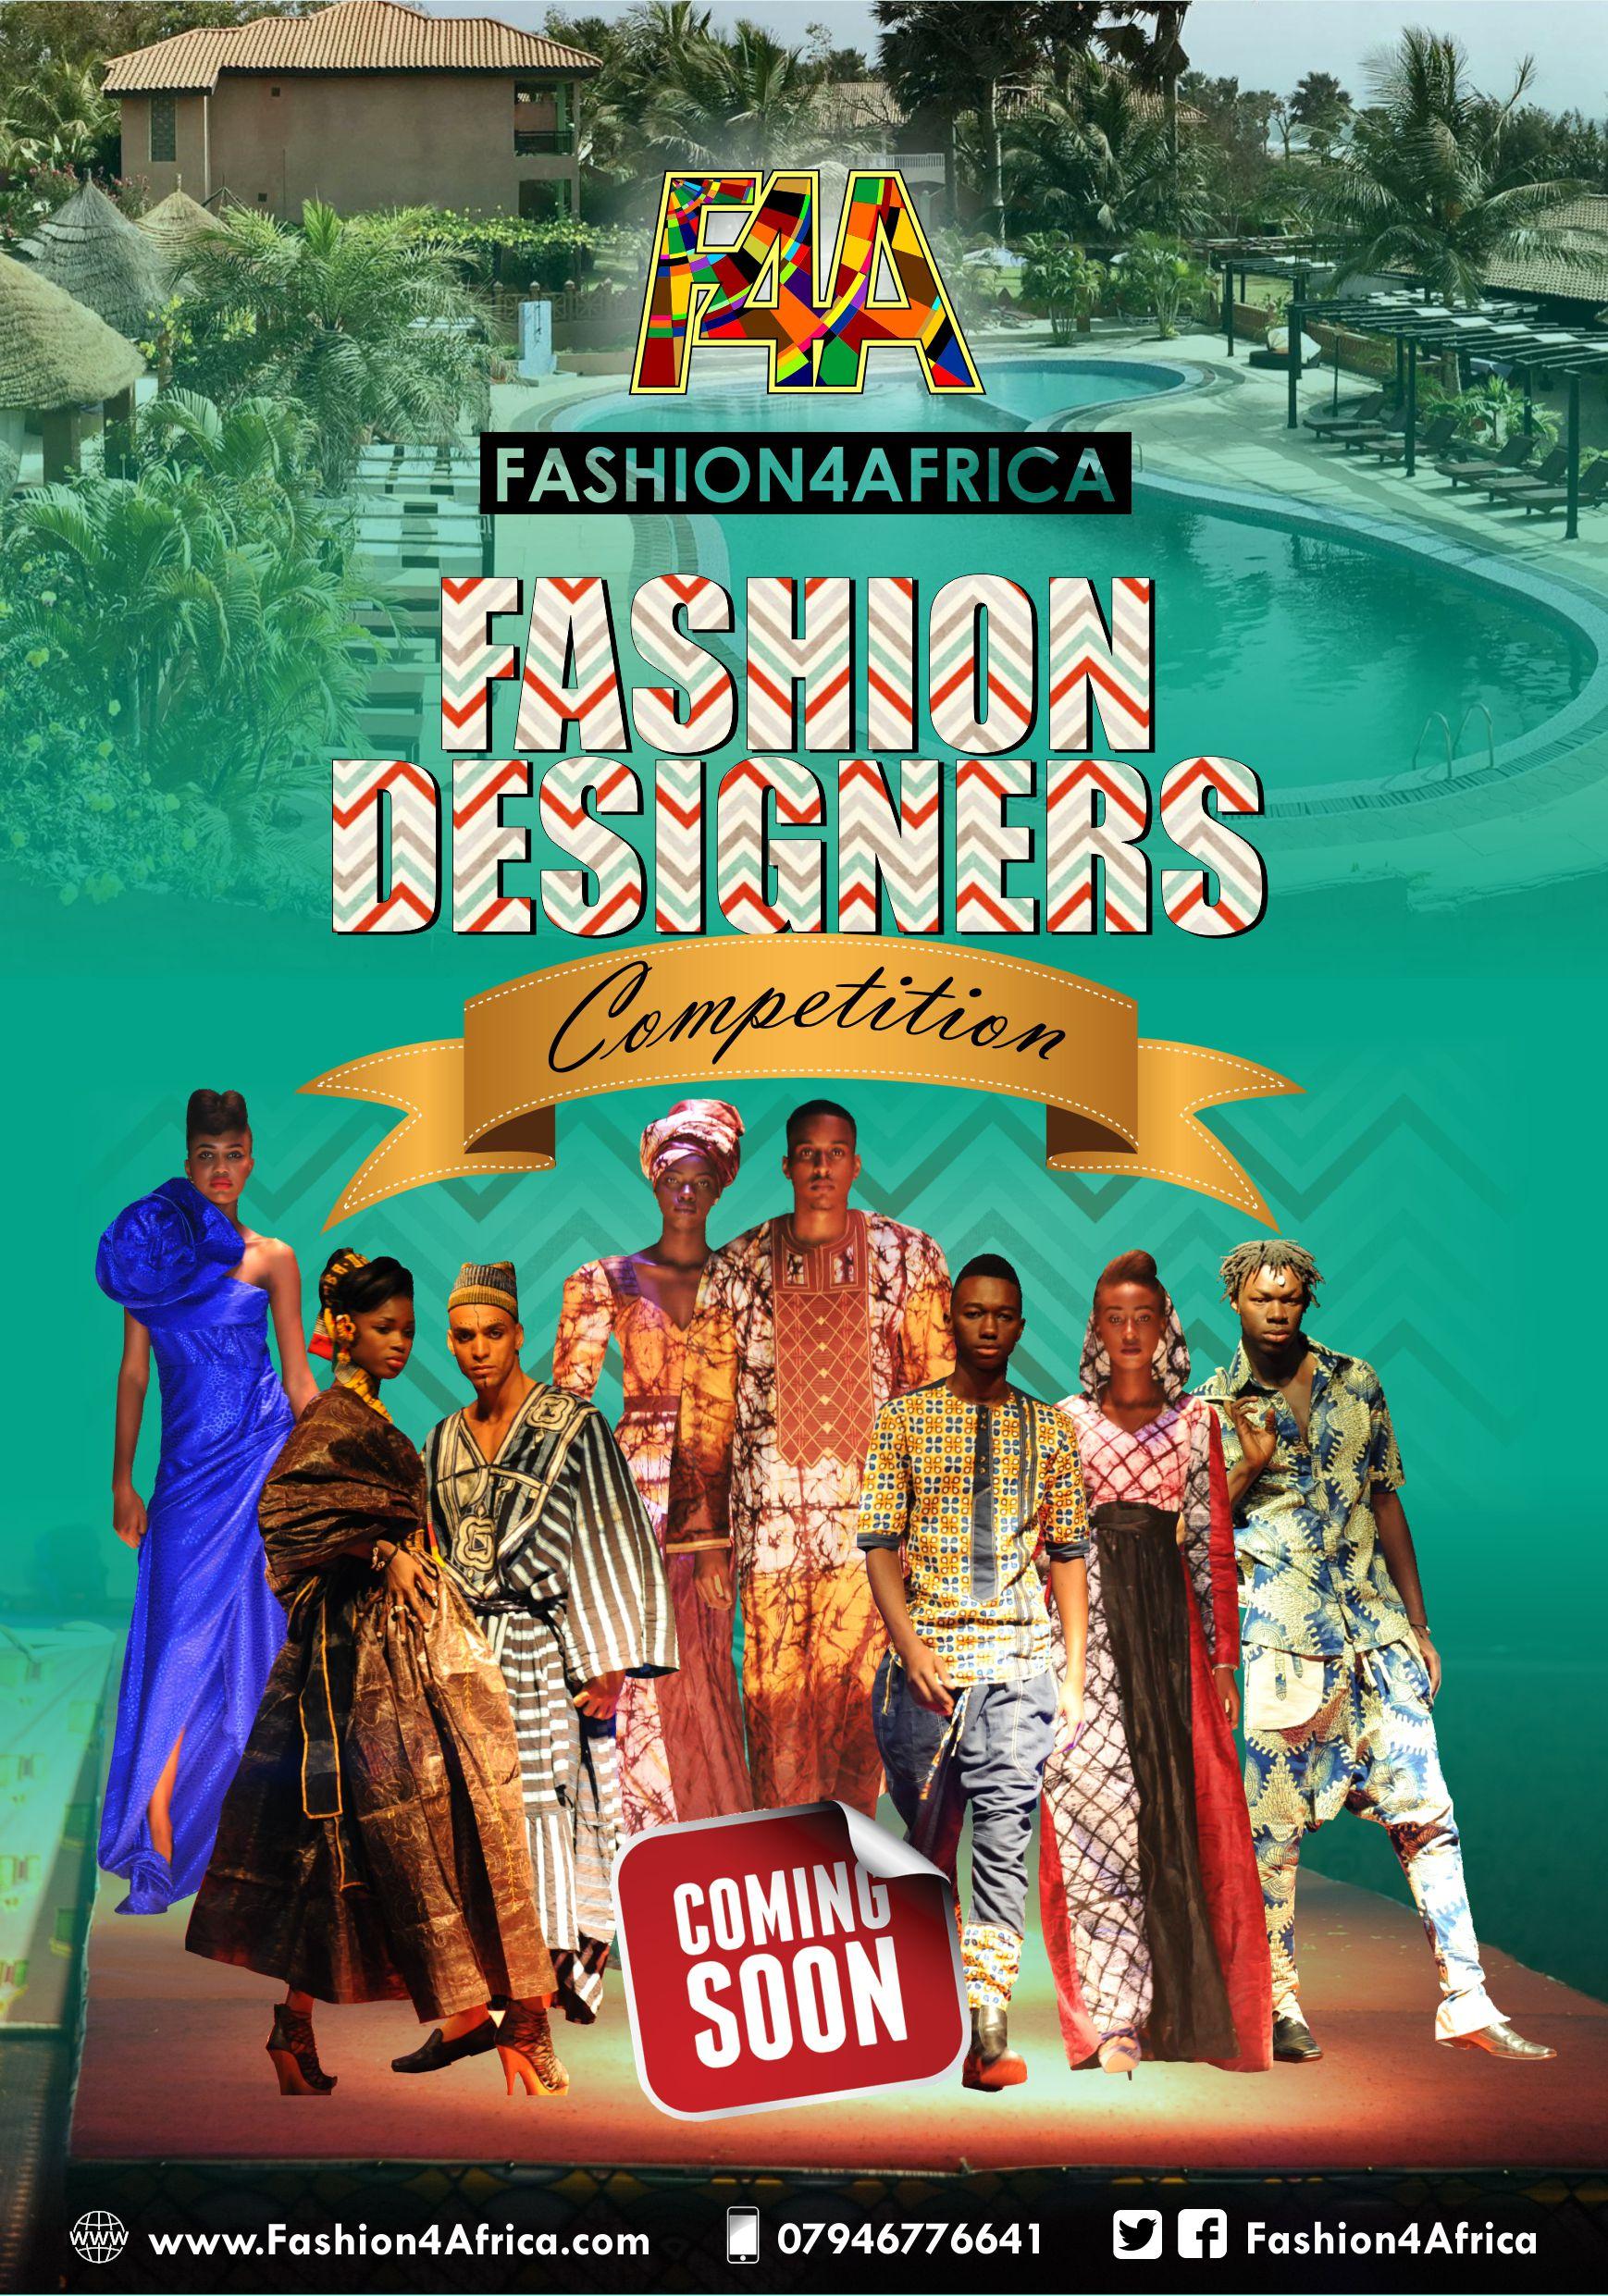 Fashion4Africa designer competition flyer